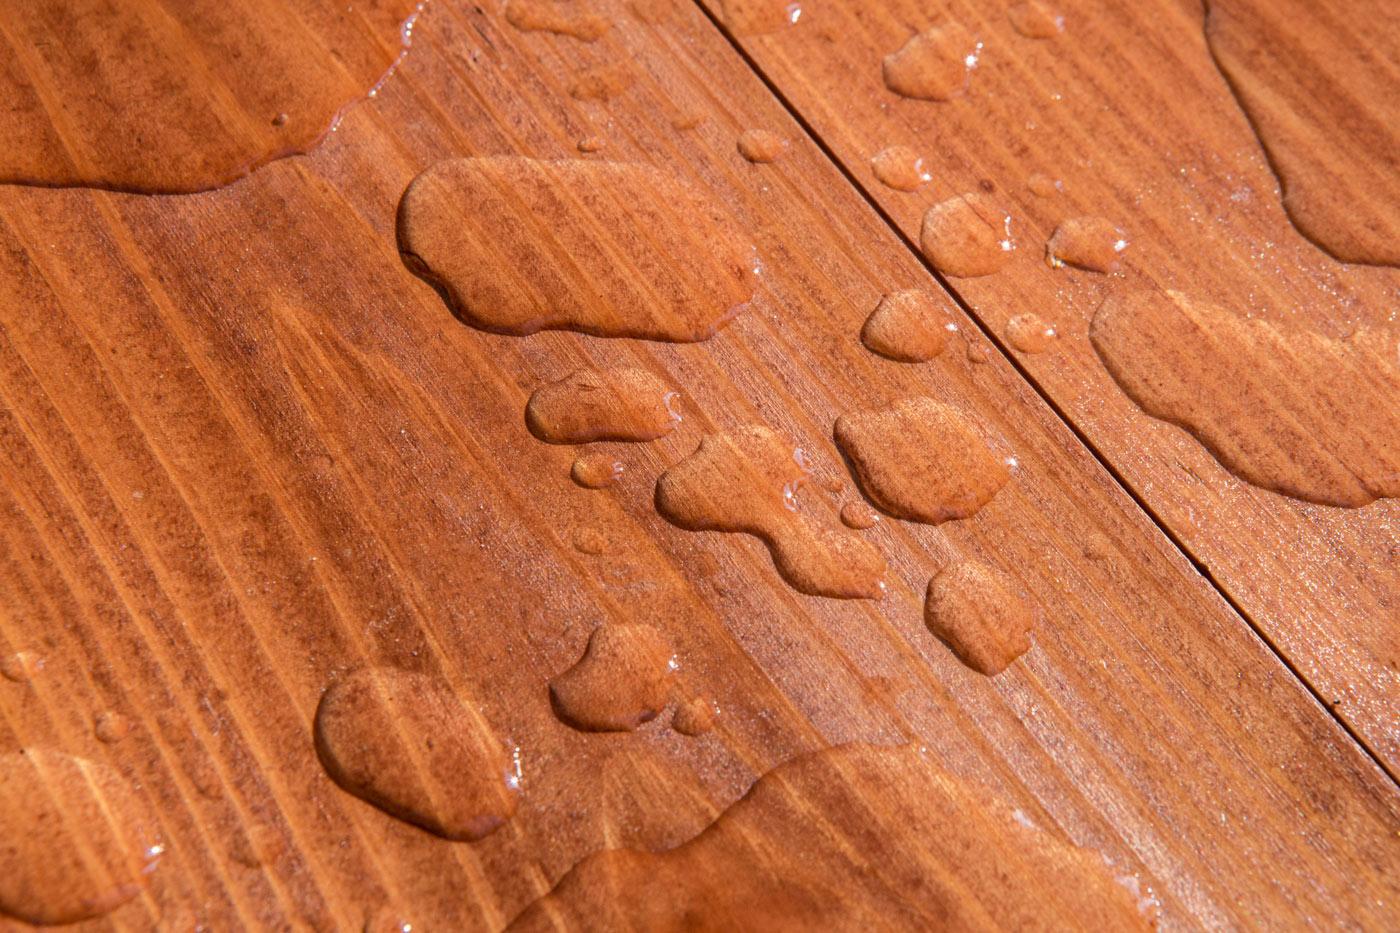 Waterproof Laminate Flooring in East Setauket NY, Millers Place NY, Sayville